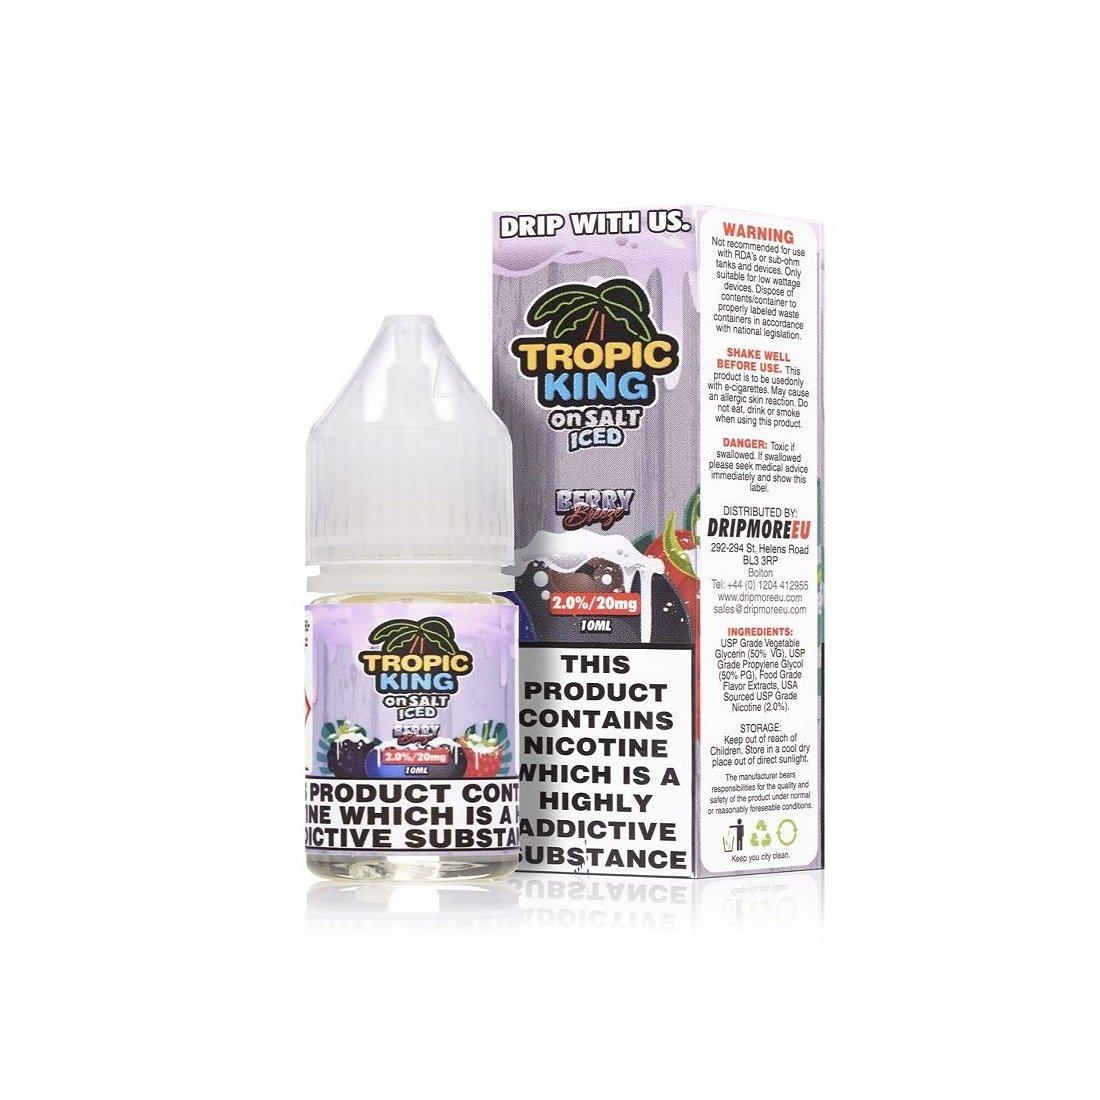 berry-breeze-iced-e-liquid-by-tropic-king-on-salt